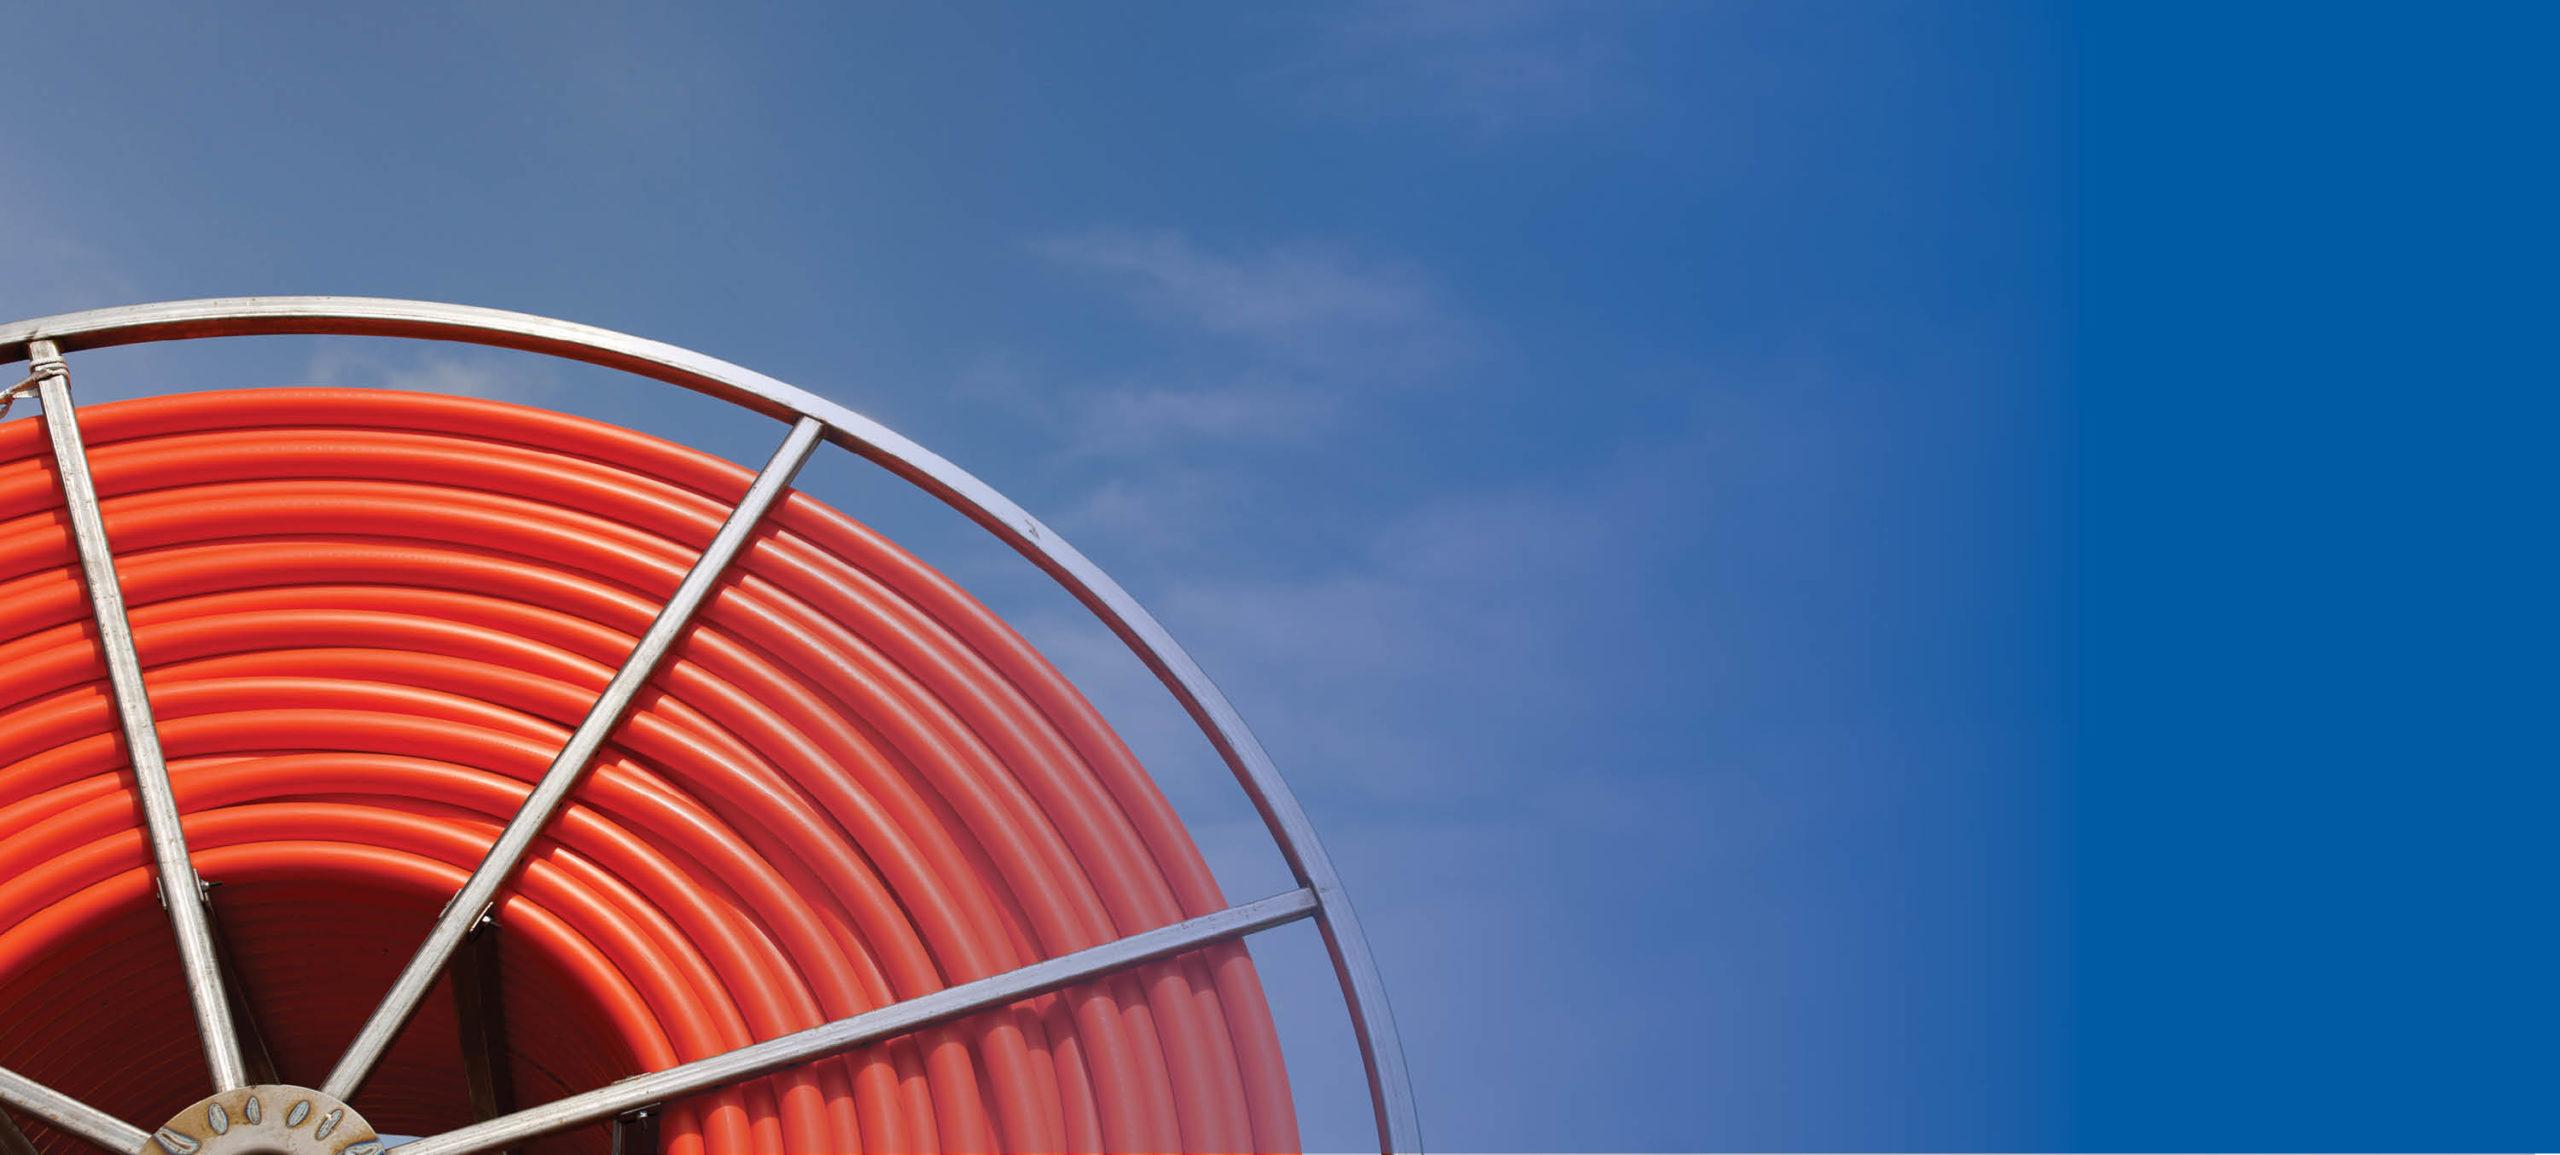 MLGC brings 5-gigabit residential internet service to North Dakota